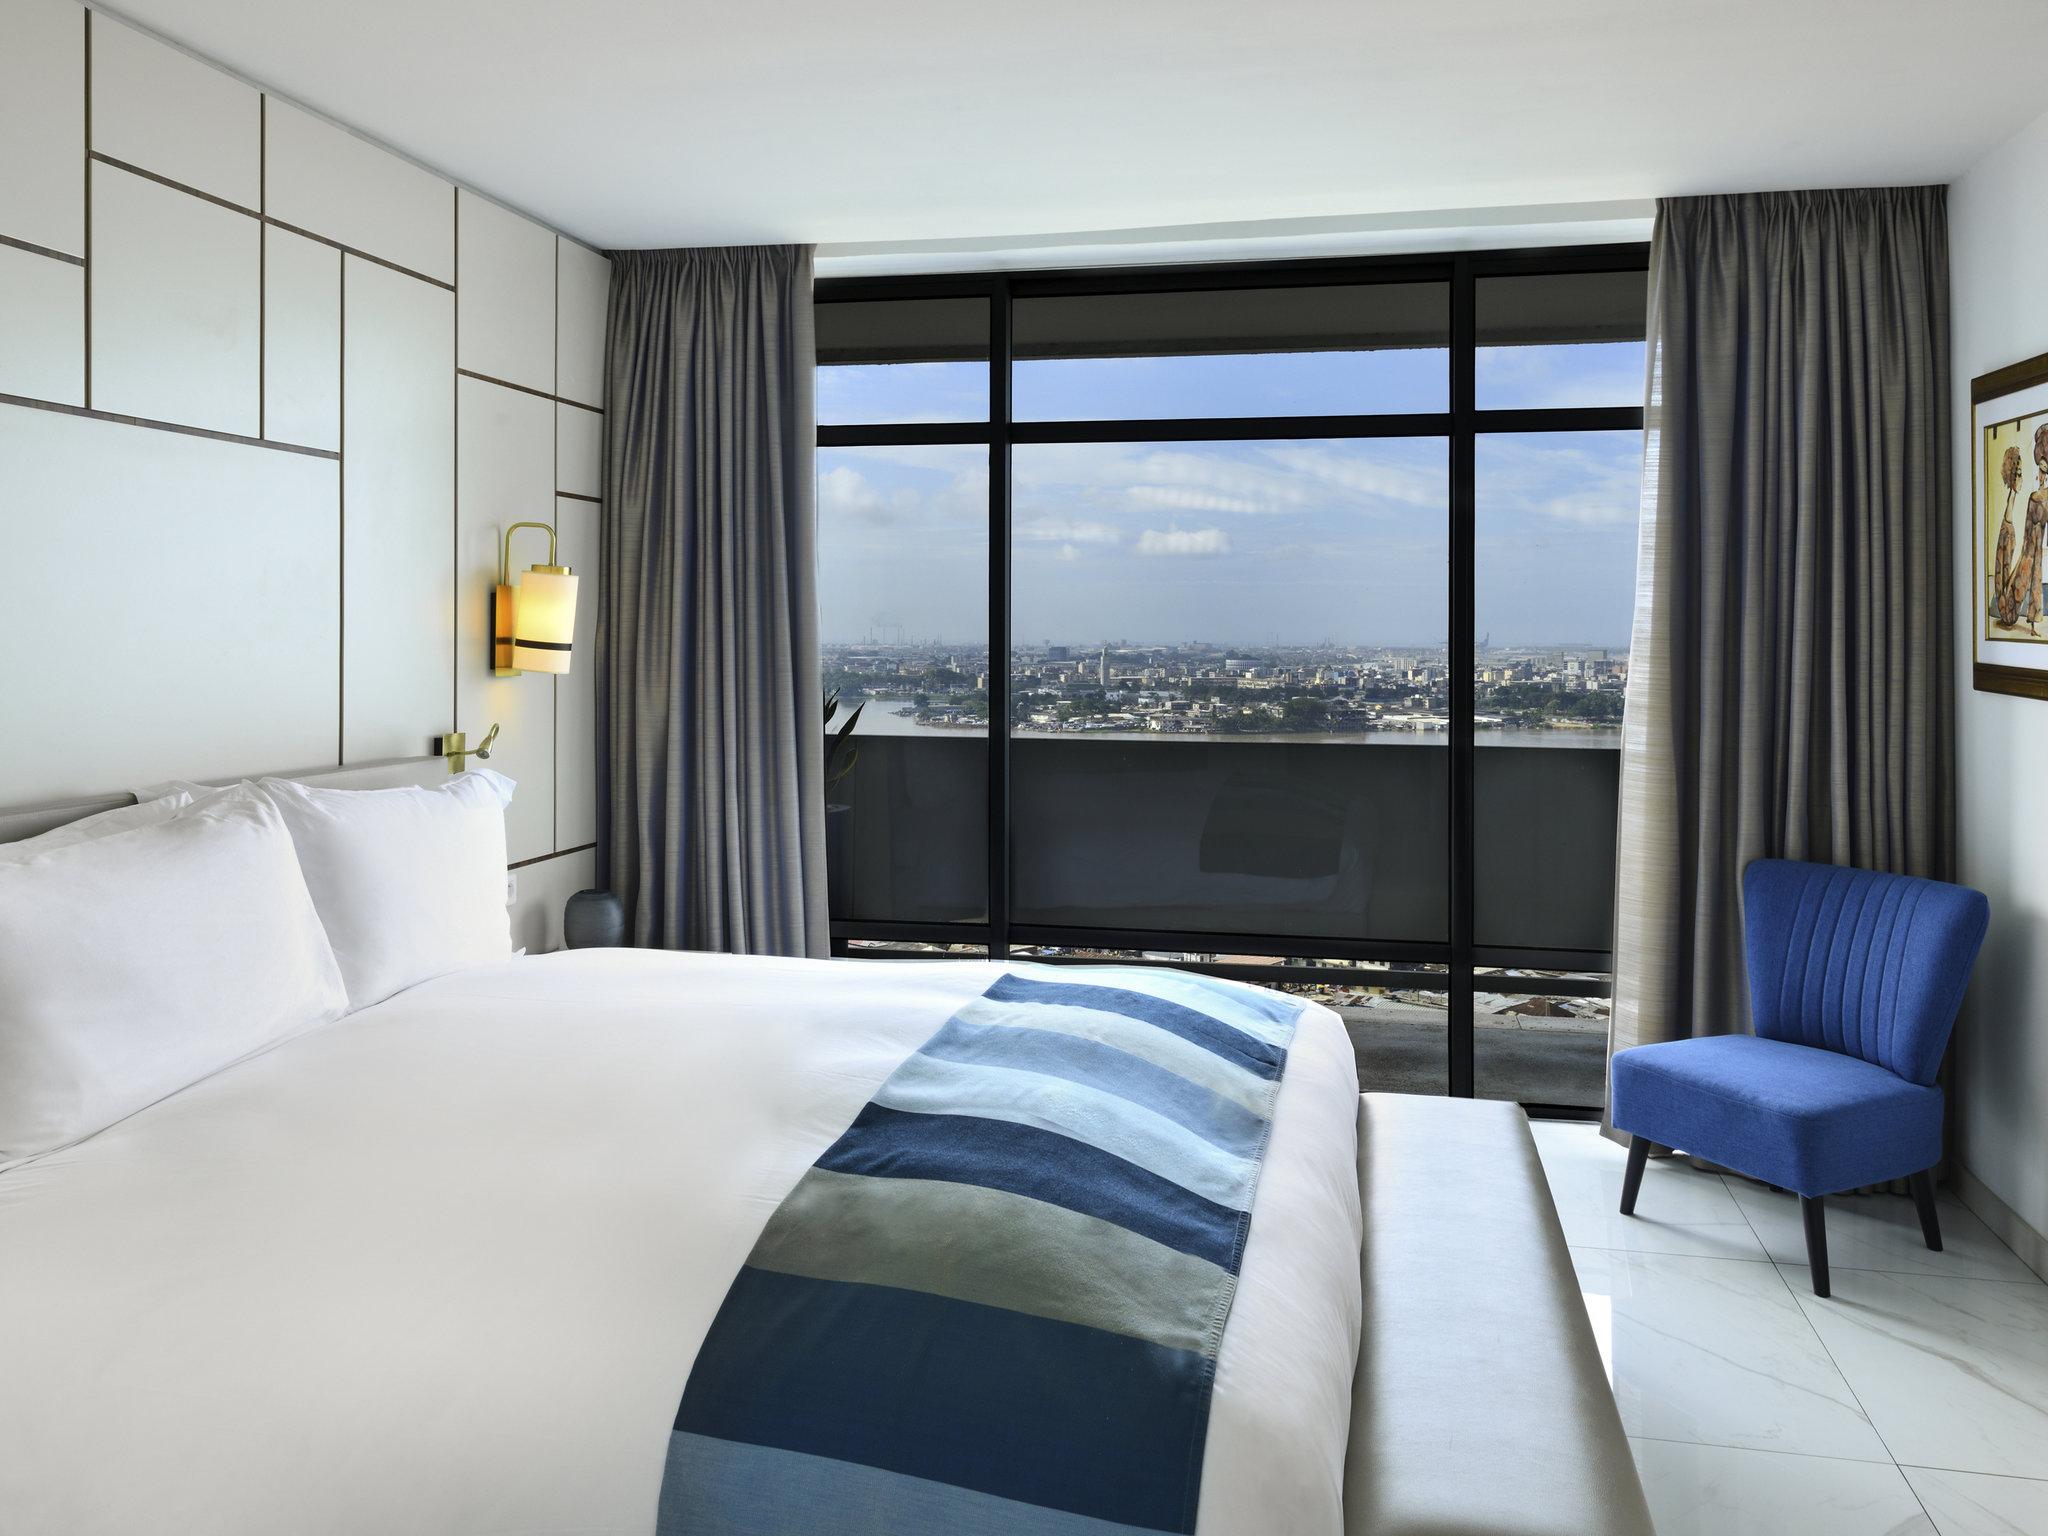 Hotel - Sofitel Abidjan Hotel Ivoire